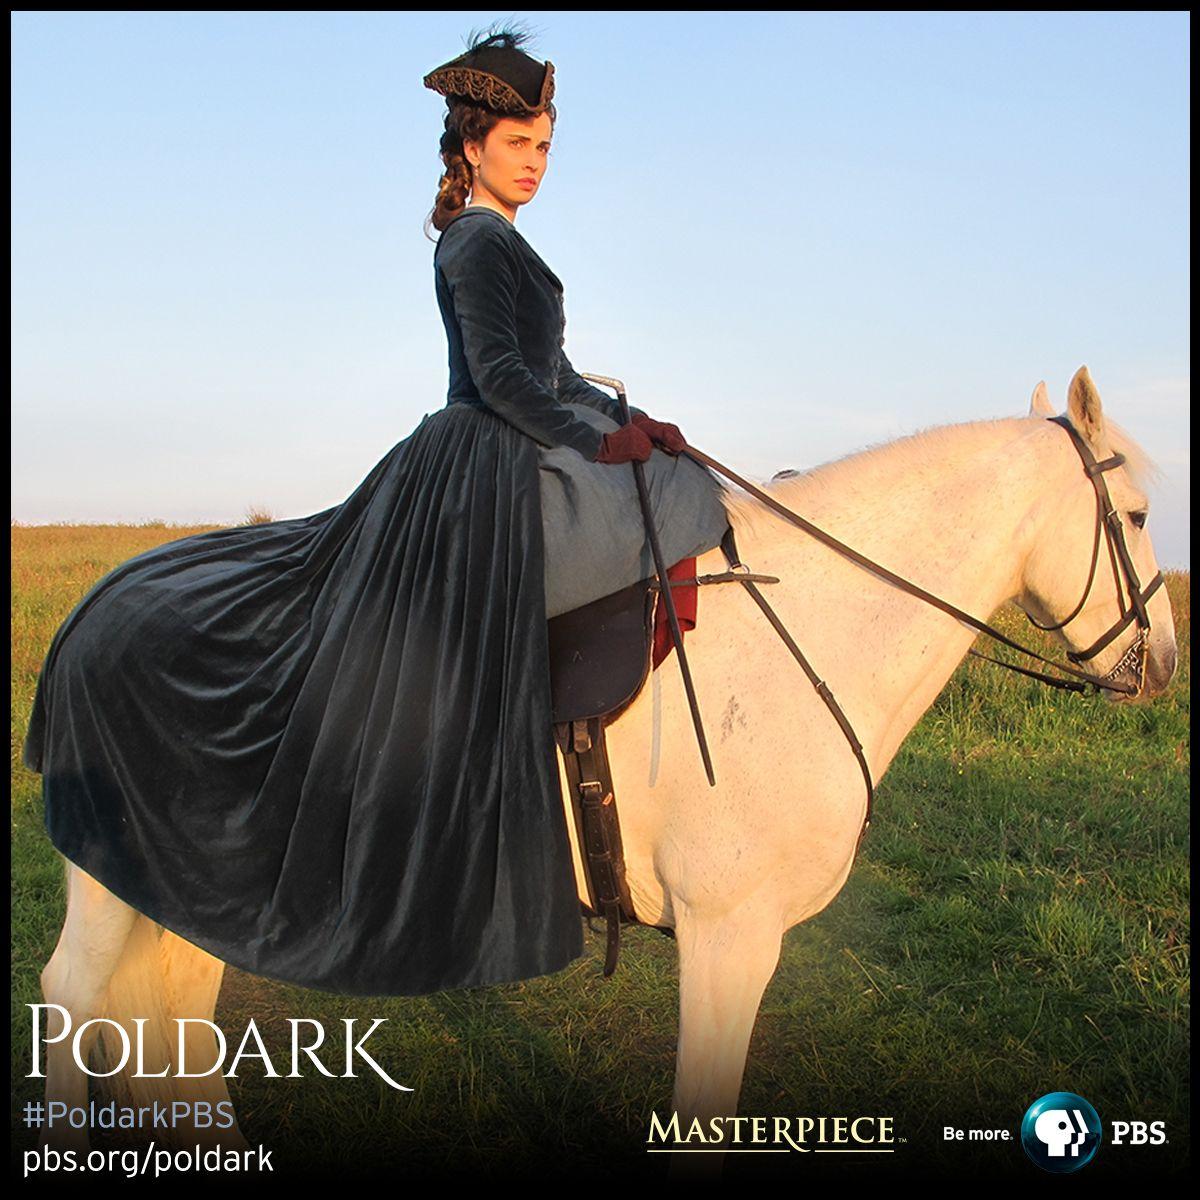 Heida Reed as Elizabeth in riding coat. | Poldark, as seen on Masterpiece PBS